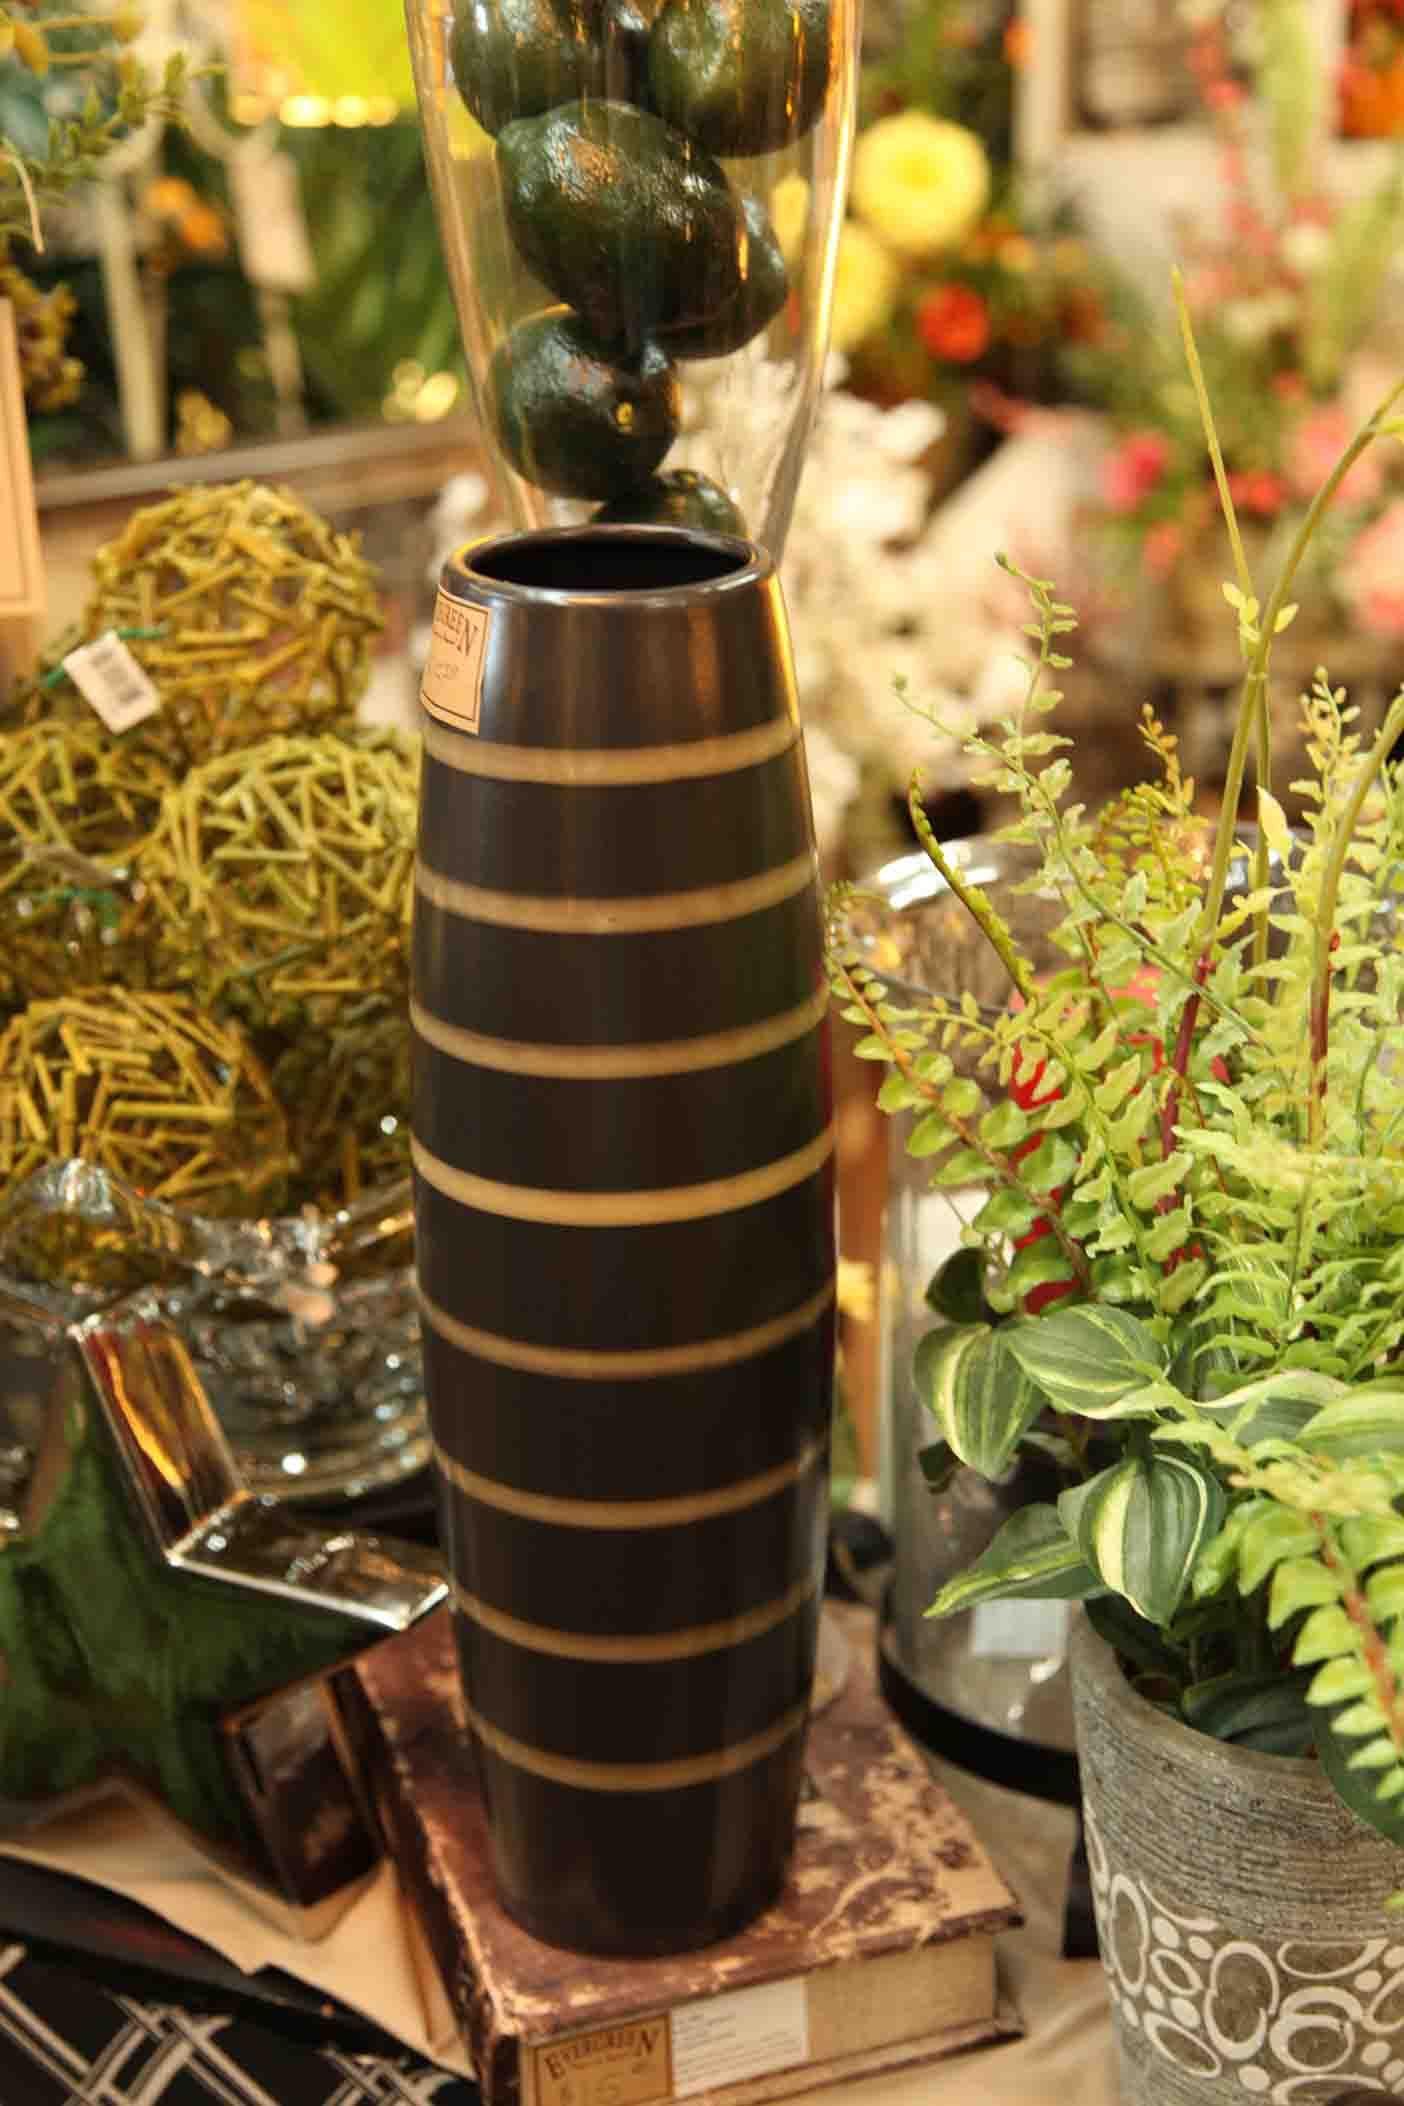 metallic brown with golden stripes vase  www.EvergreenMfg.net